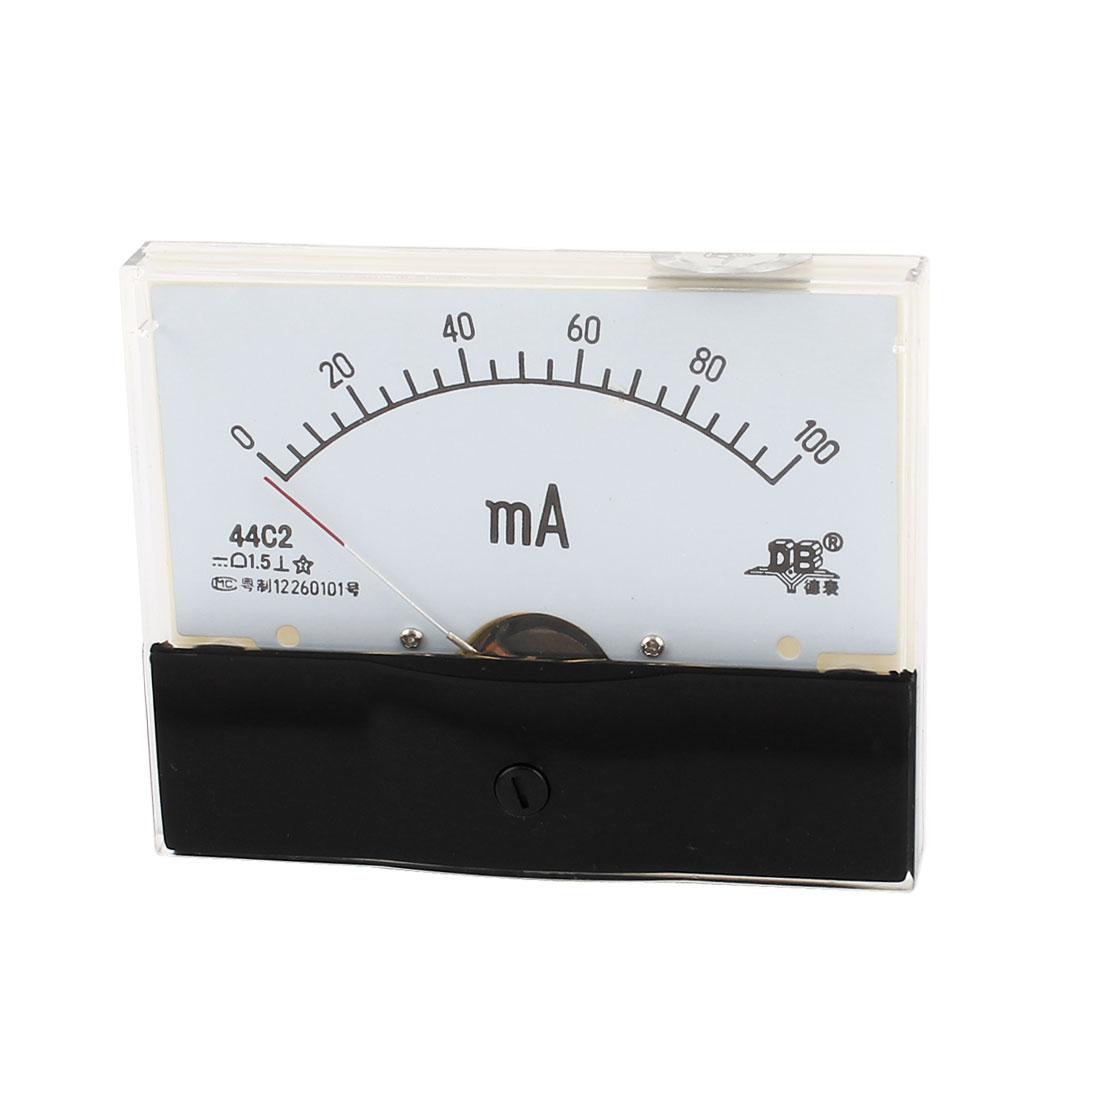 Fine Turning Dial DC 0-100mA Analog Ammeter Panel Meter 44C2